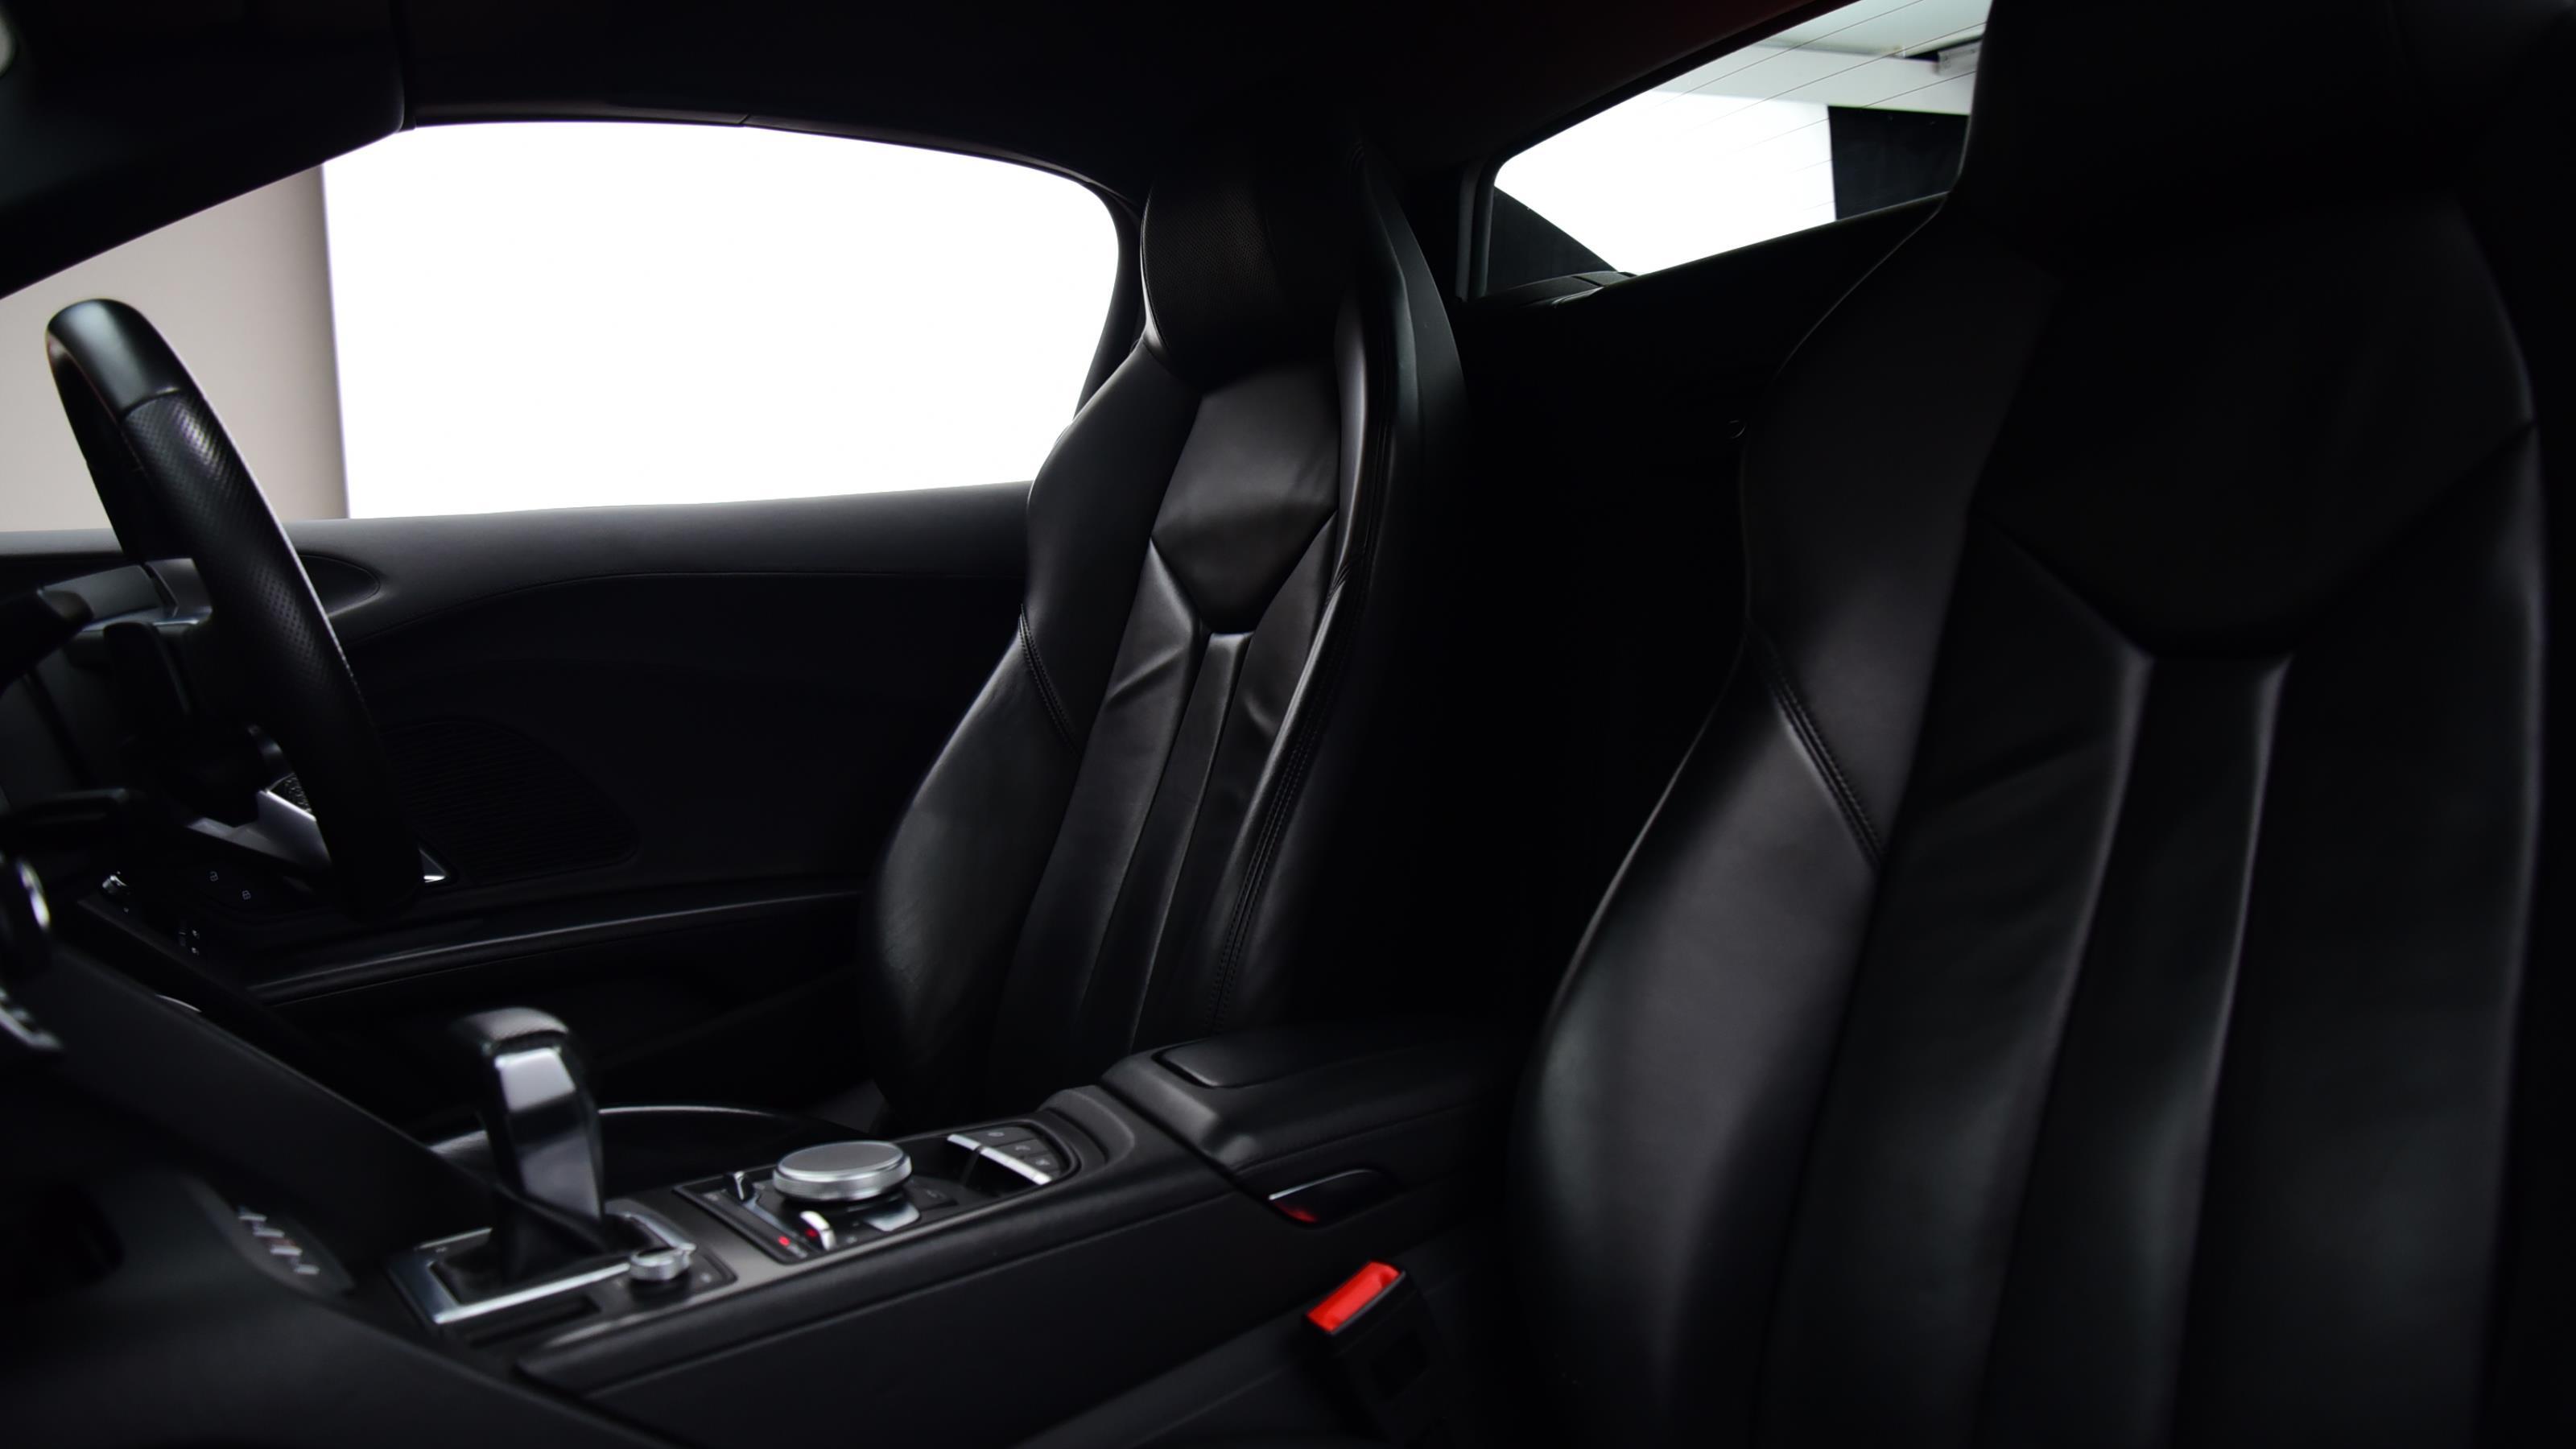 Used 2016 Audi R8 5.2 FSI V10 Quattro 2dr S Tronic Red at Saxton4x4